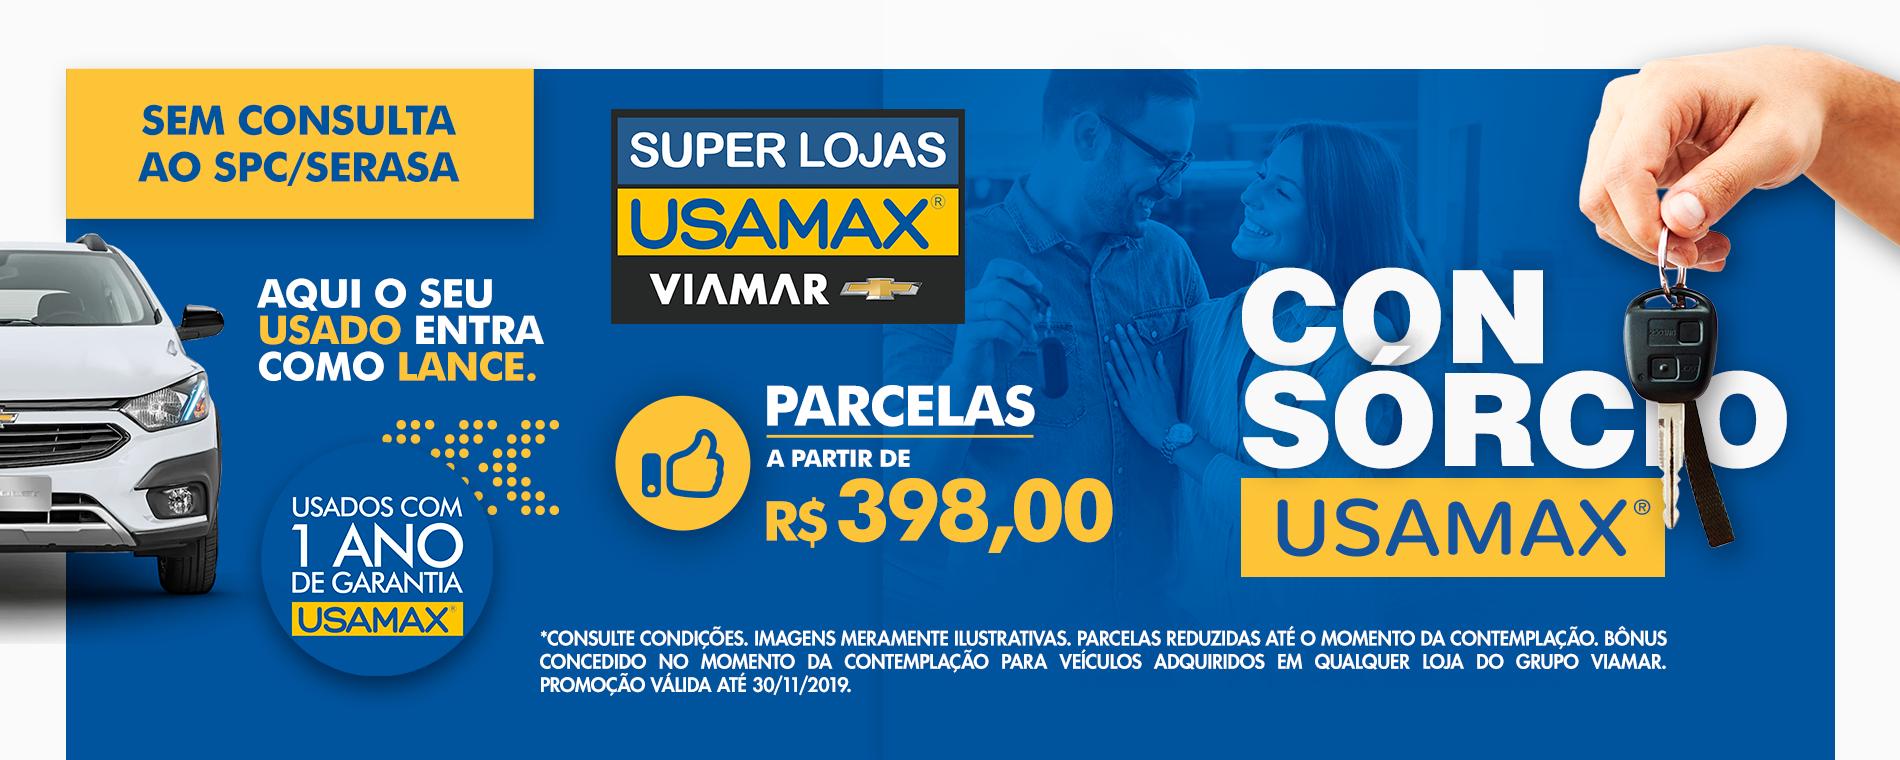 191101-viamar-banner-consorciousamax-1900x760-v2